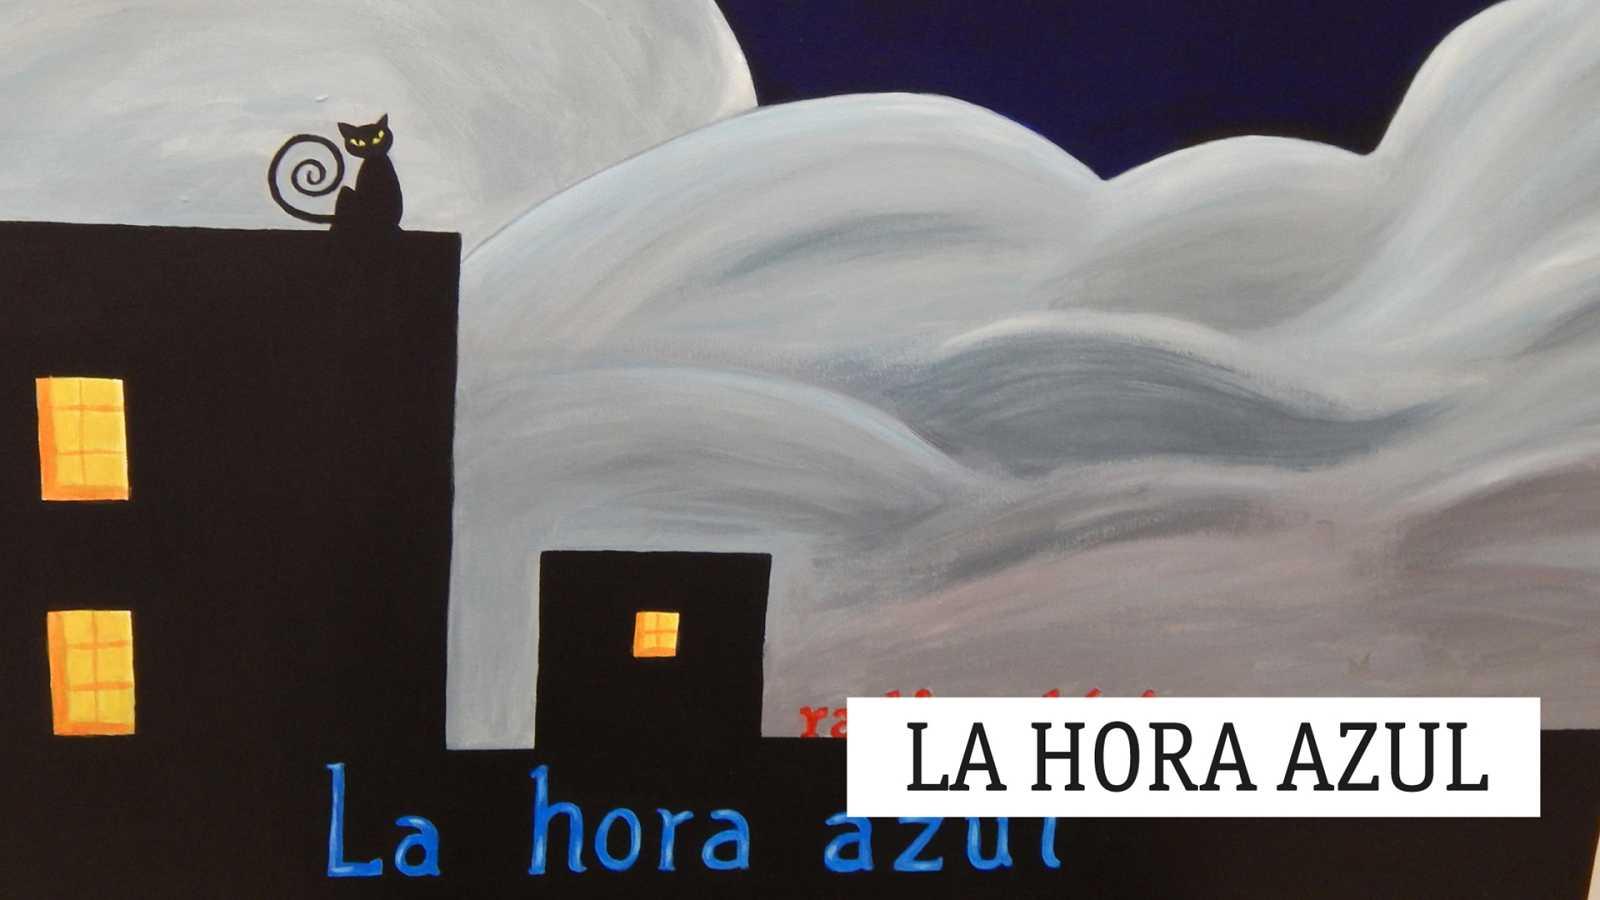 La hora azul - Carmen Laffón/Melodías de Fauré - 05/05/21 - escuchar ahora